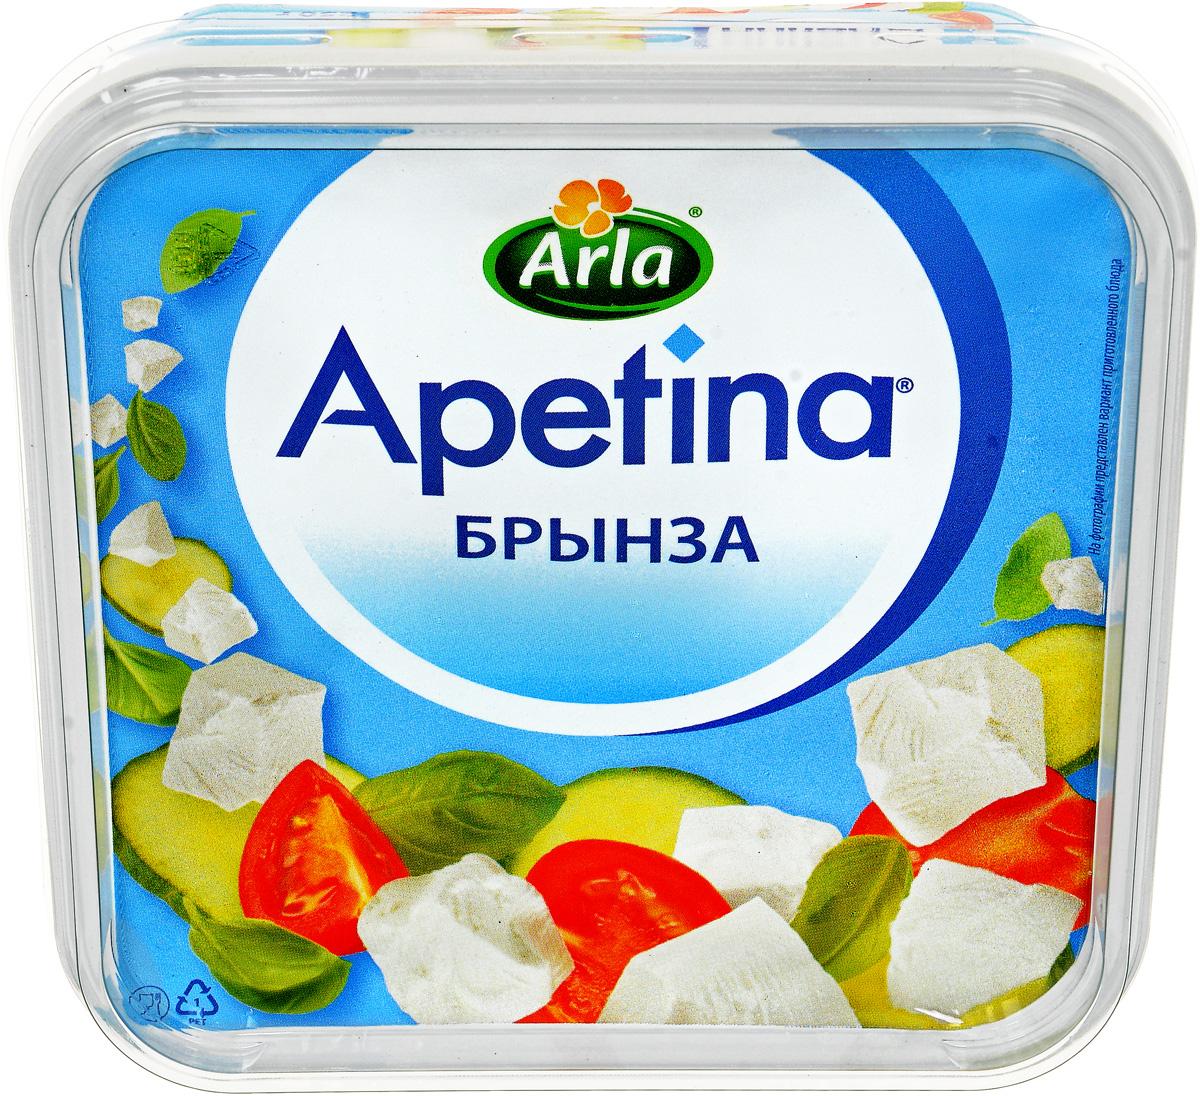 Arla Apetina Сыр Брынза, 250 г arla natura сыр сливочный 45% нарезка 150 г